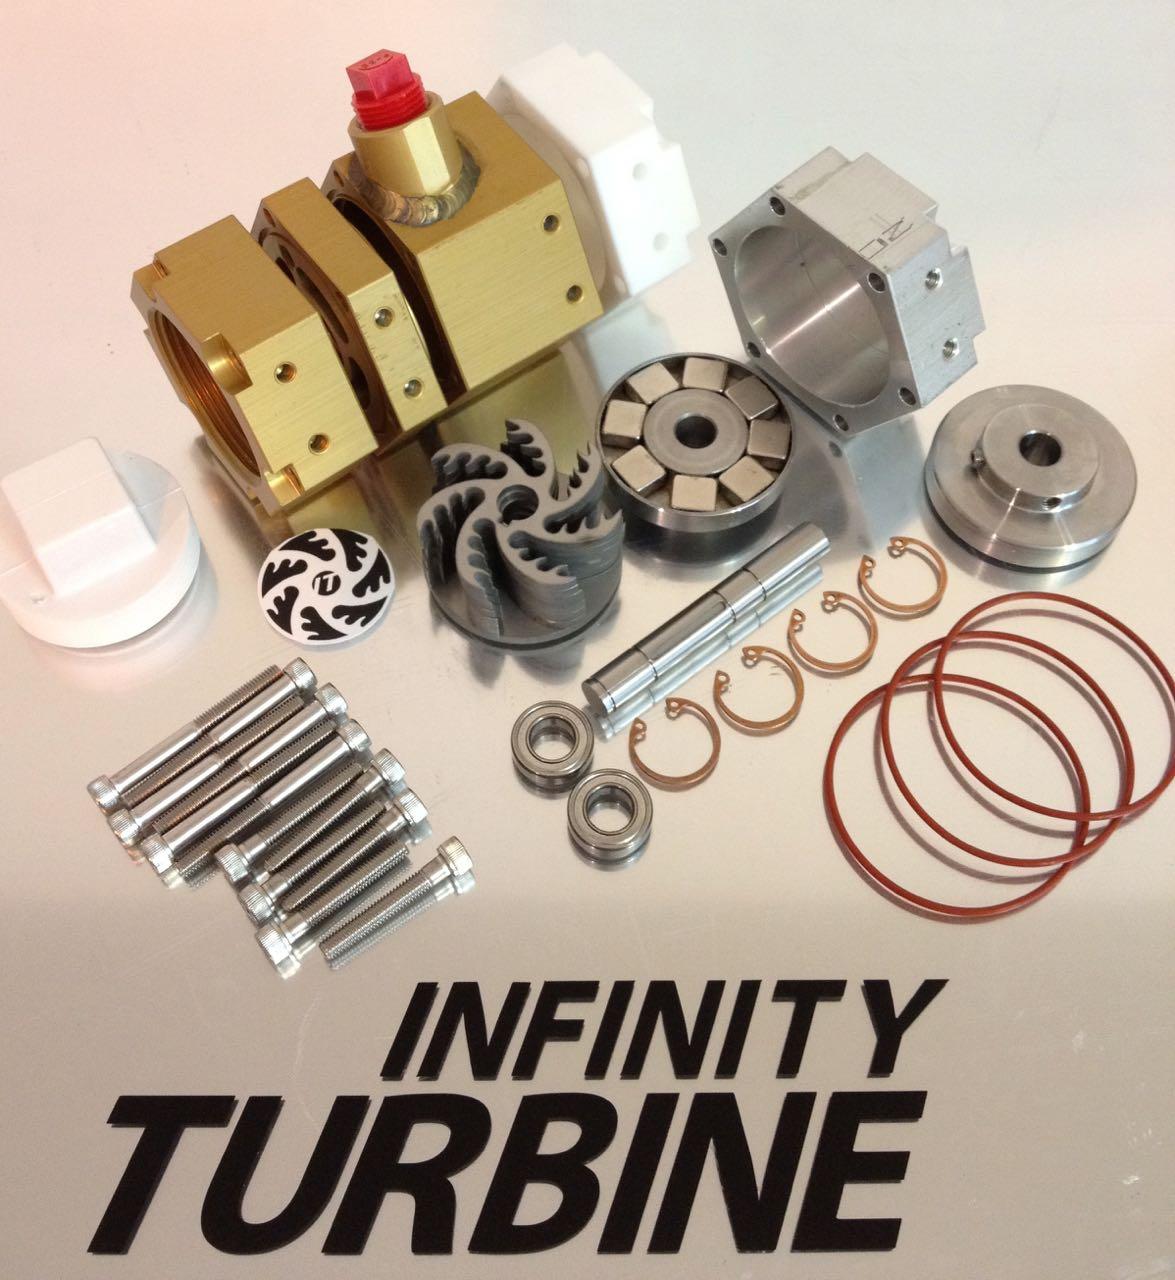 Infinity Turbine ITmini tubine generator kit